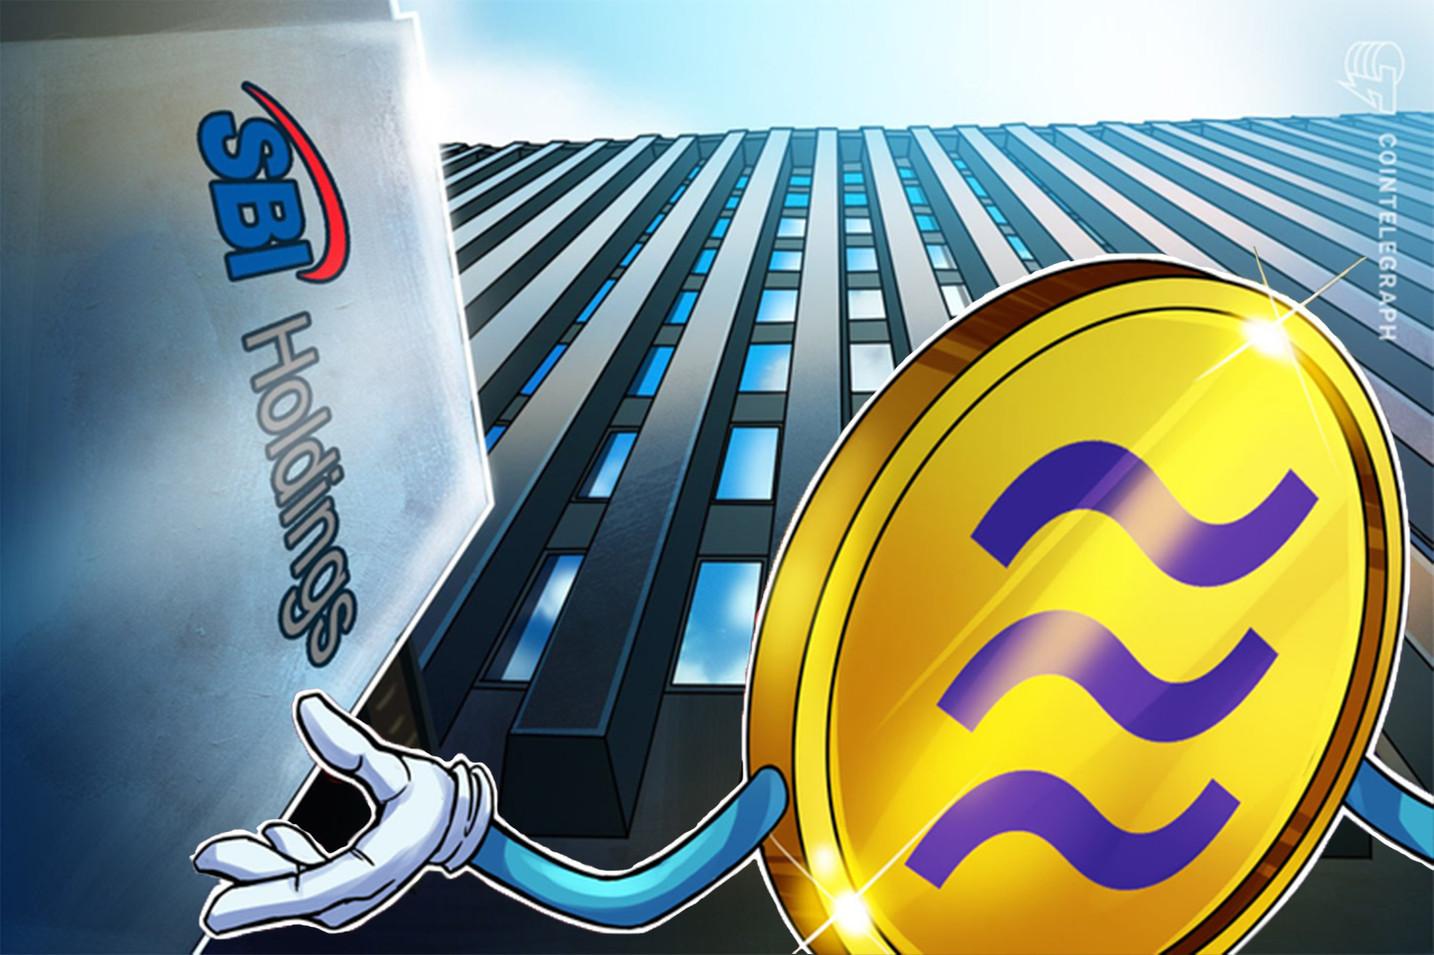 SBI北尾CEO、フェイスブックの仮想通貨リブラへの参加について「話は来ている」